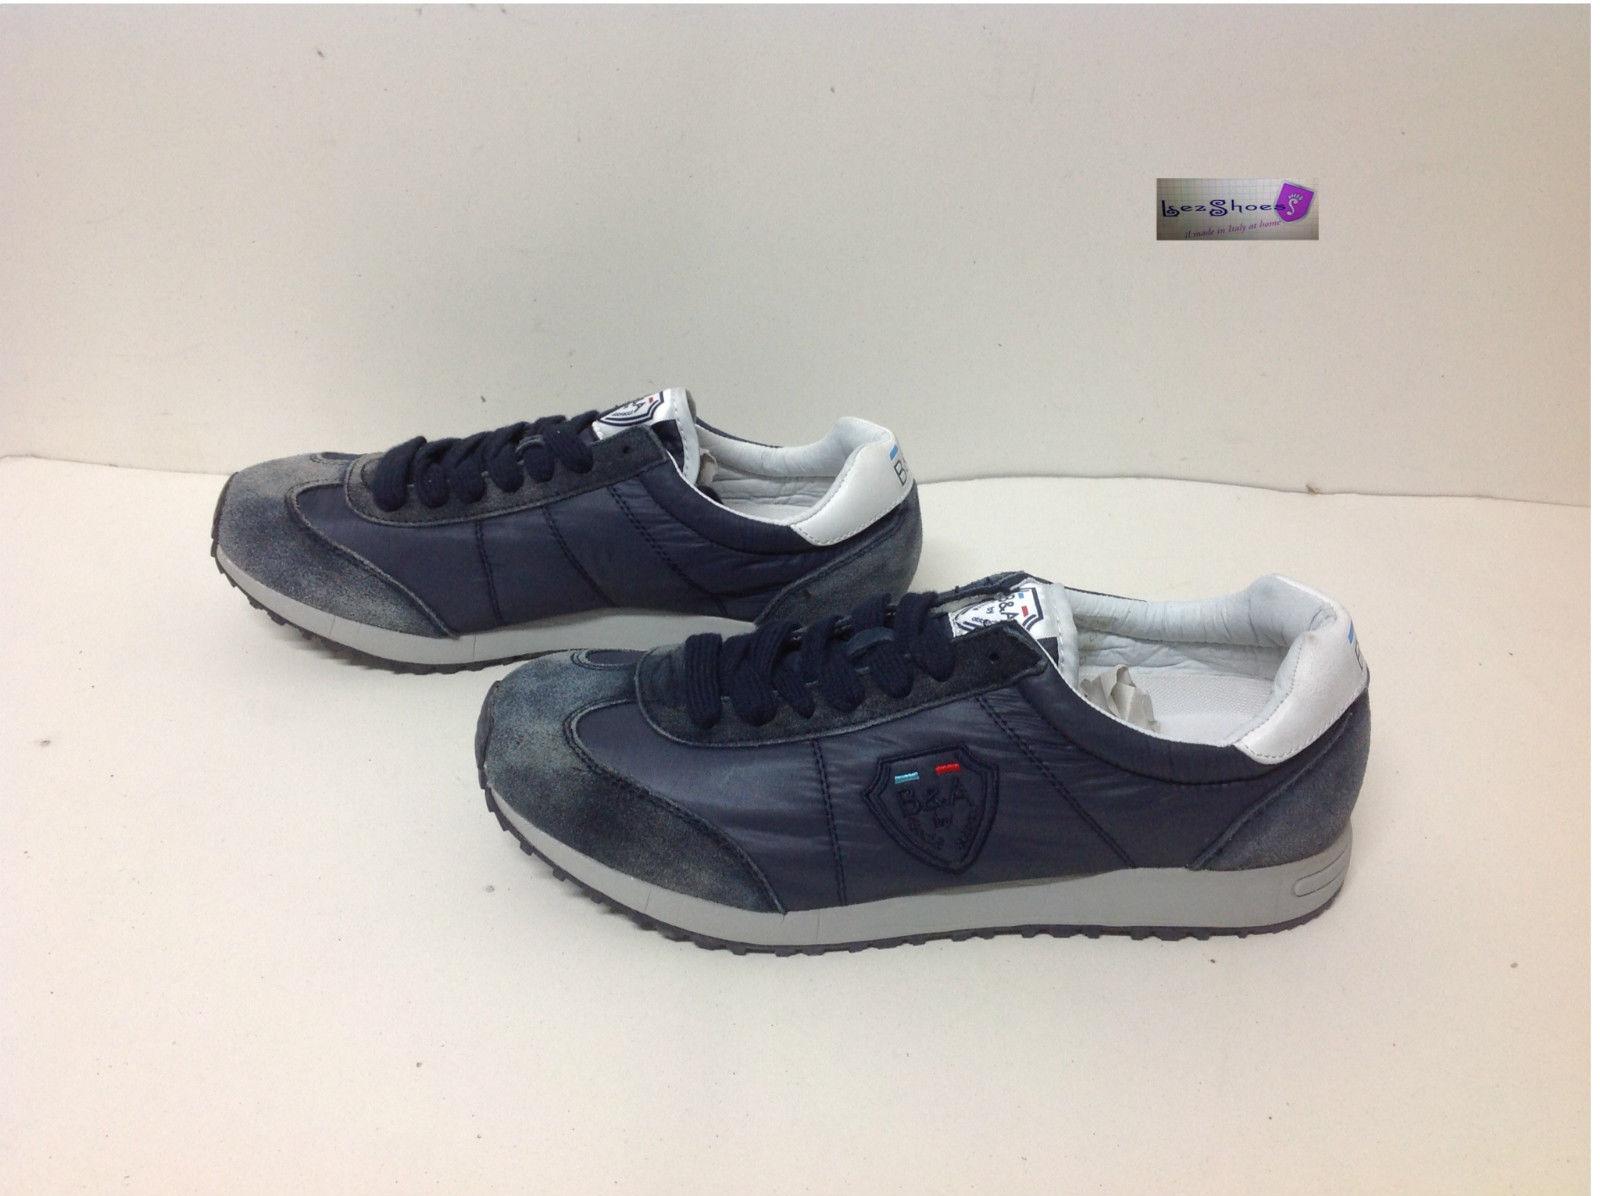 brand new 68616 8da6b Dettagli su scarpe sneaker basse uomo Baci E Abbracci vintage blu origin